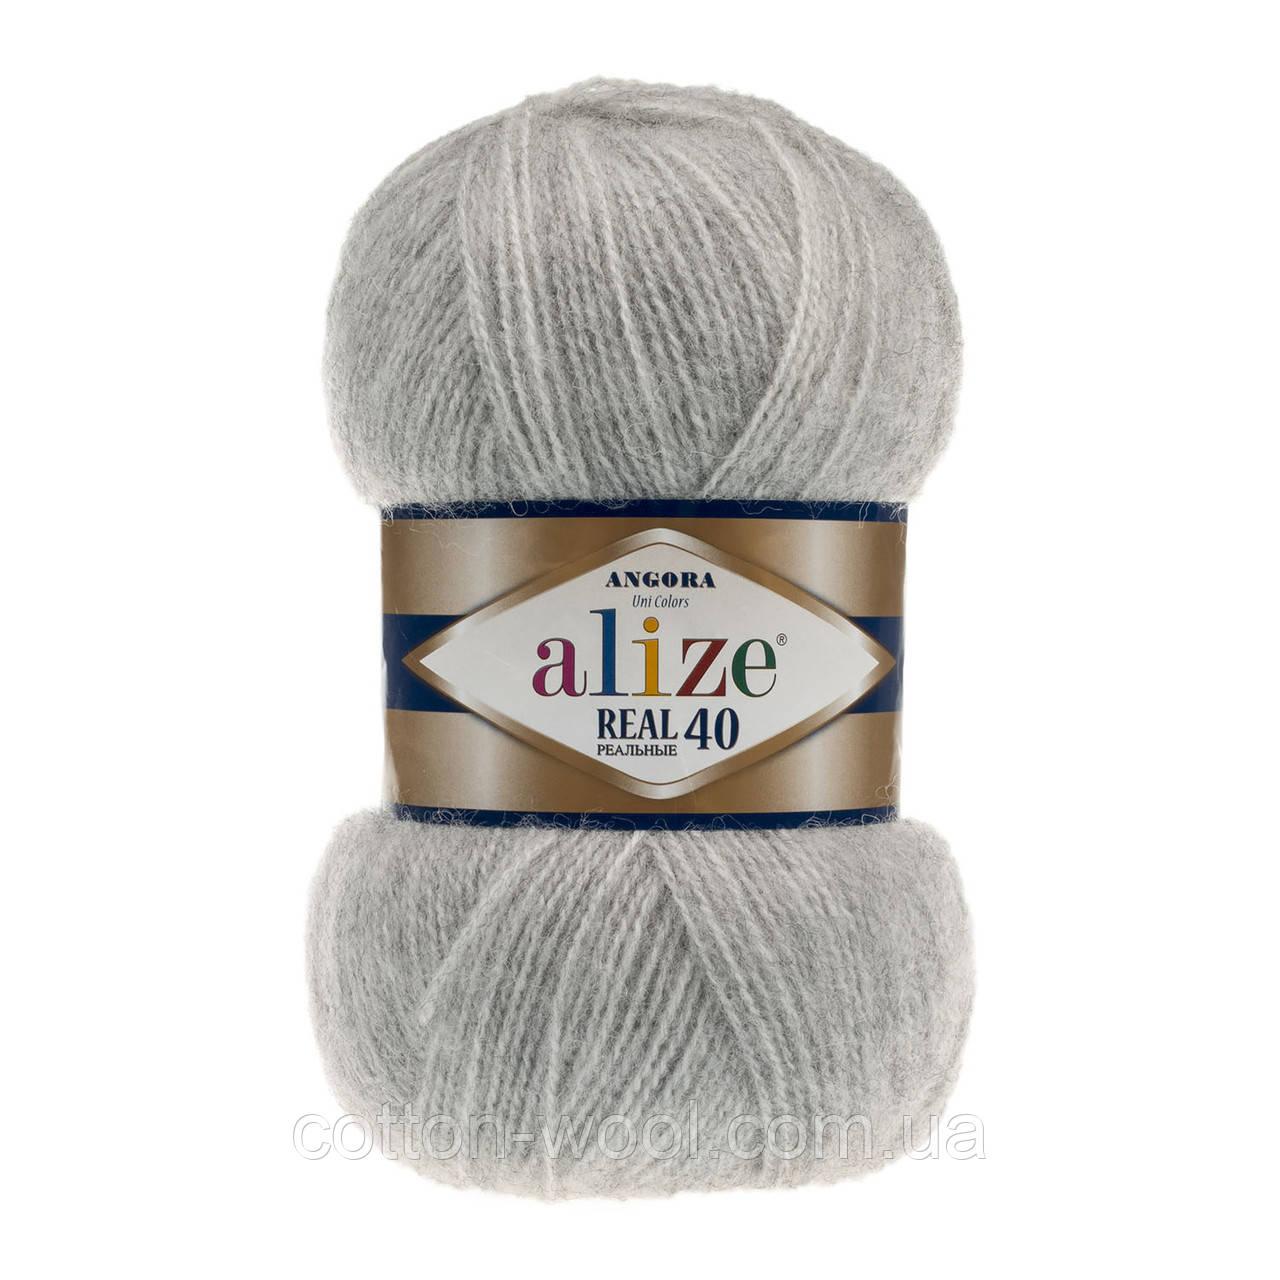 Alize Angora Real 40 (Ализе Ангора реал 40)  614